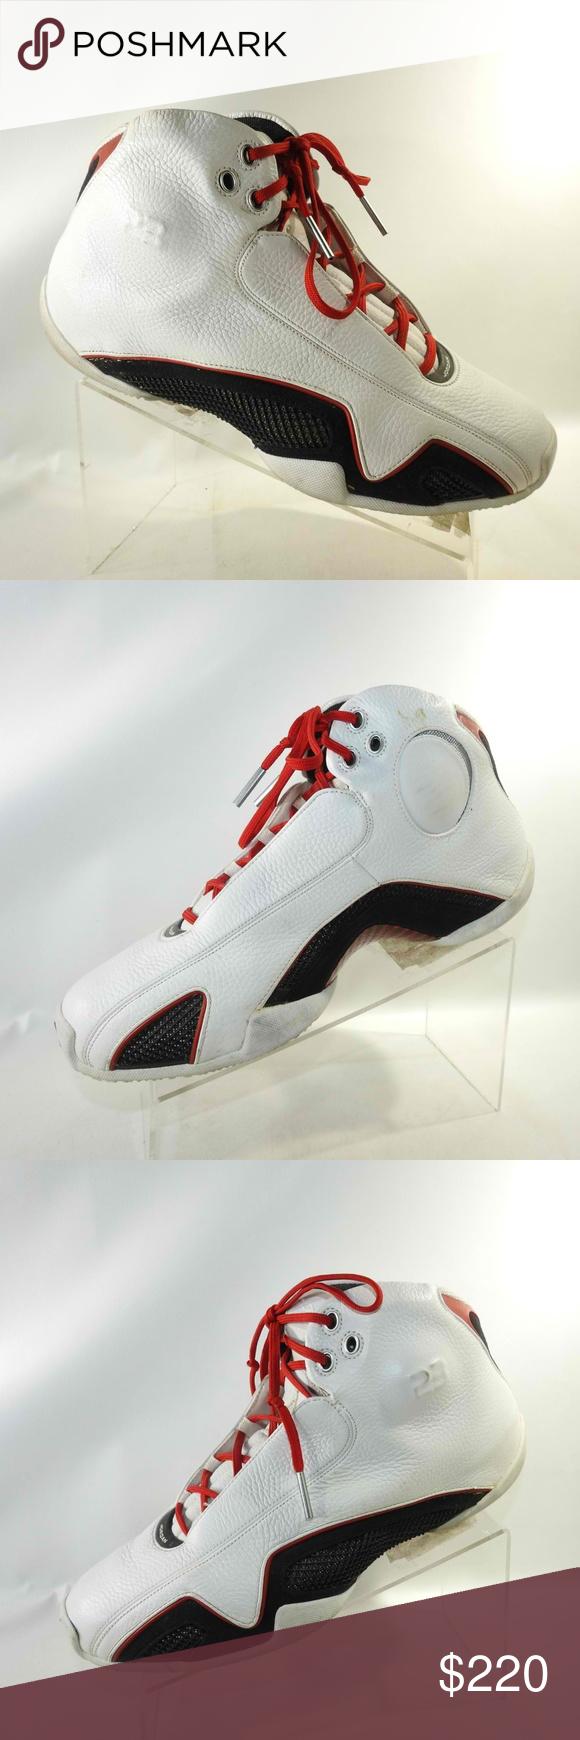 7d91b0048af Nike Air Jordan 21 XXI Size 11.5 Sports Mens Shoes 2005 Nike Air Jordan 21  XXI